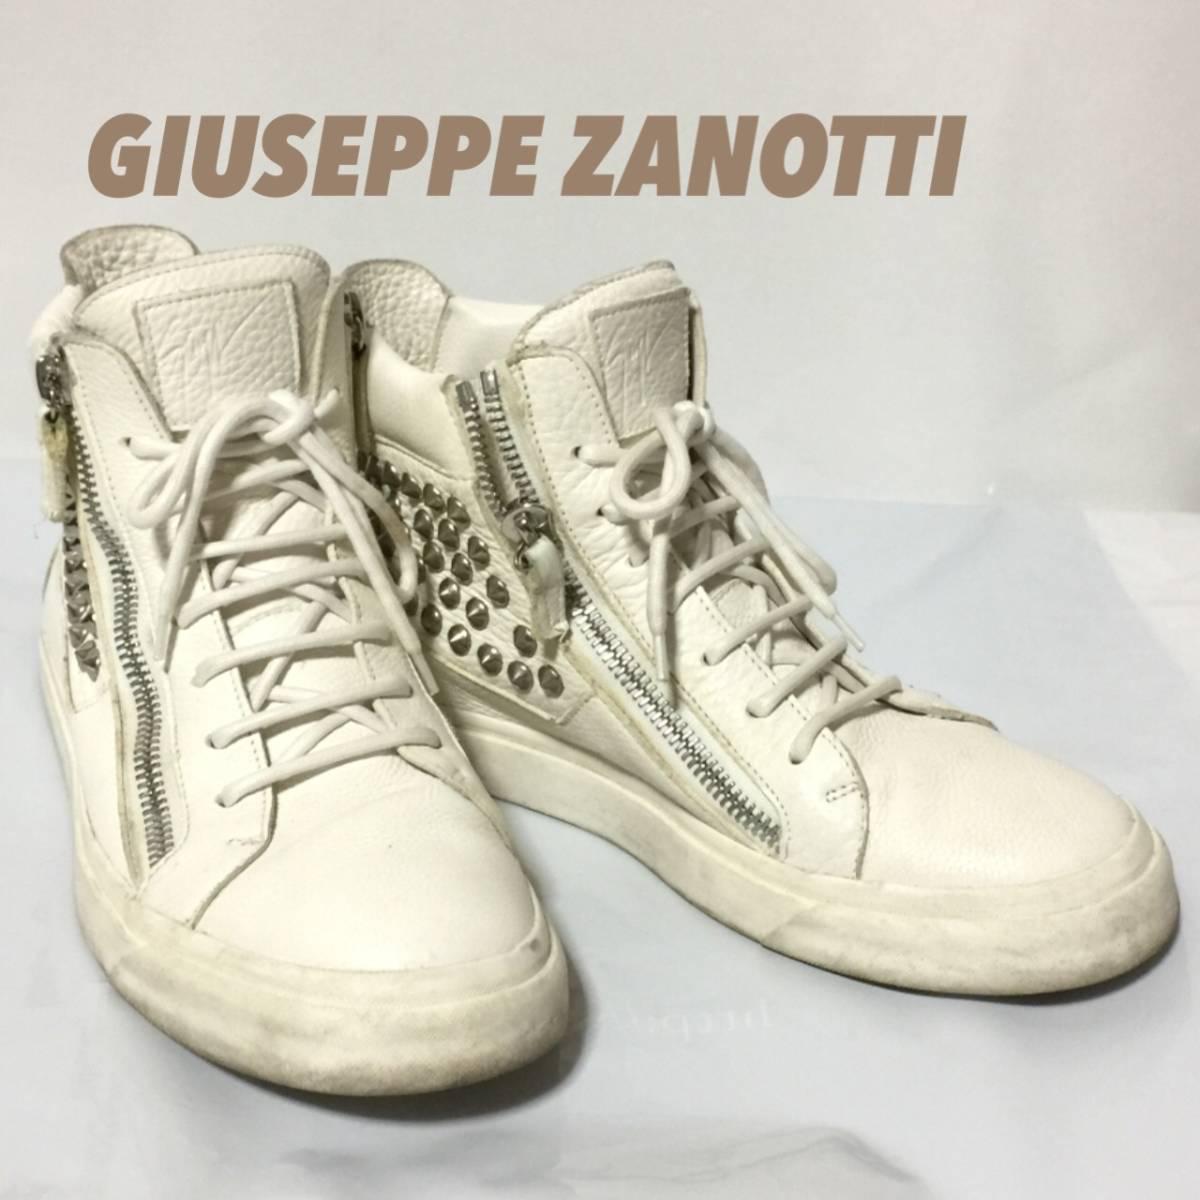 3ca914b81dbc7c ジュゼッペザノッティ スタッズ スニーカー/GIUSEPPE ZANOTTI ハイカット/41/メンズ/イタリア製の1